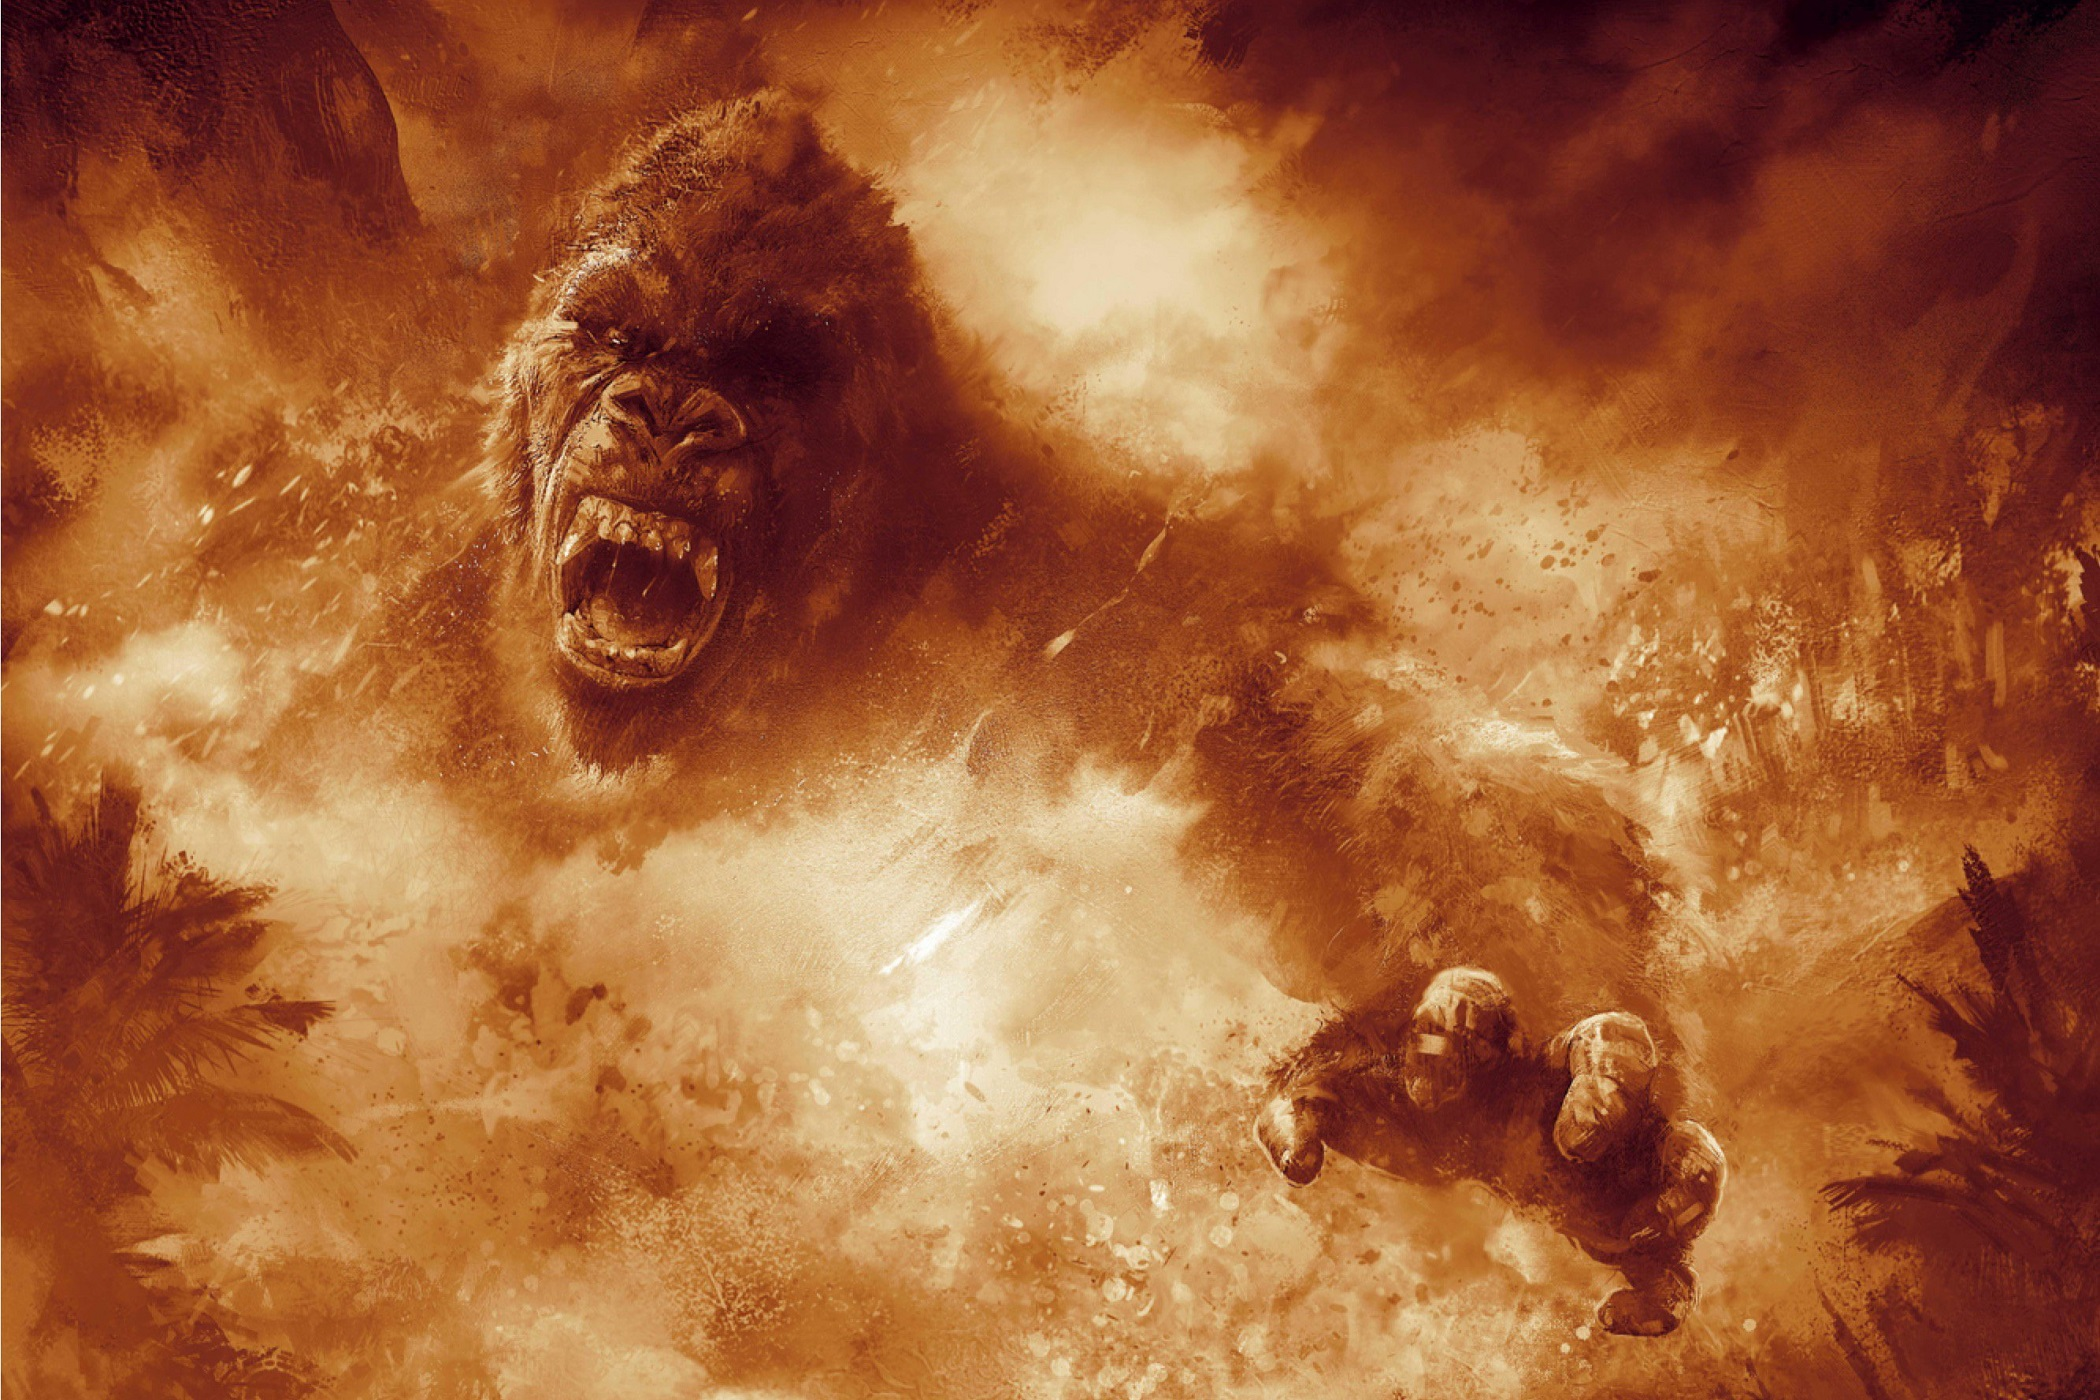 Kong: Skull Island HD Wallpaper